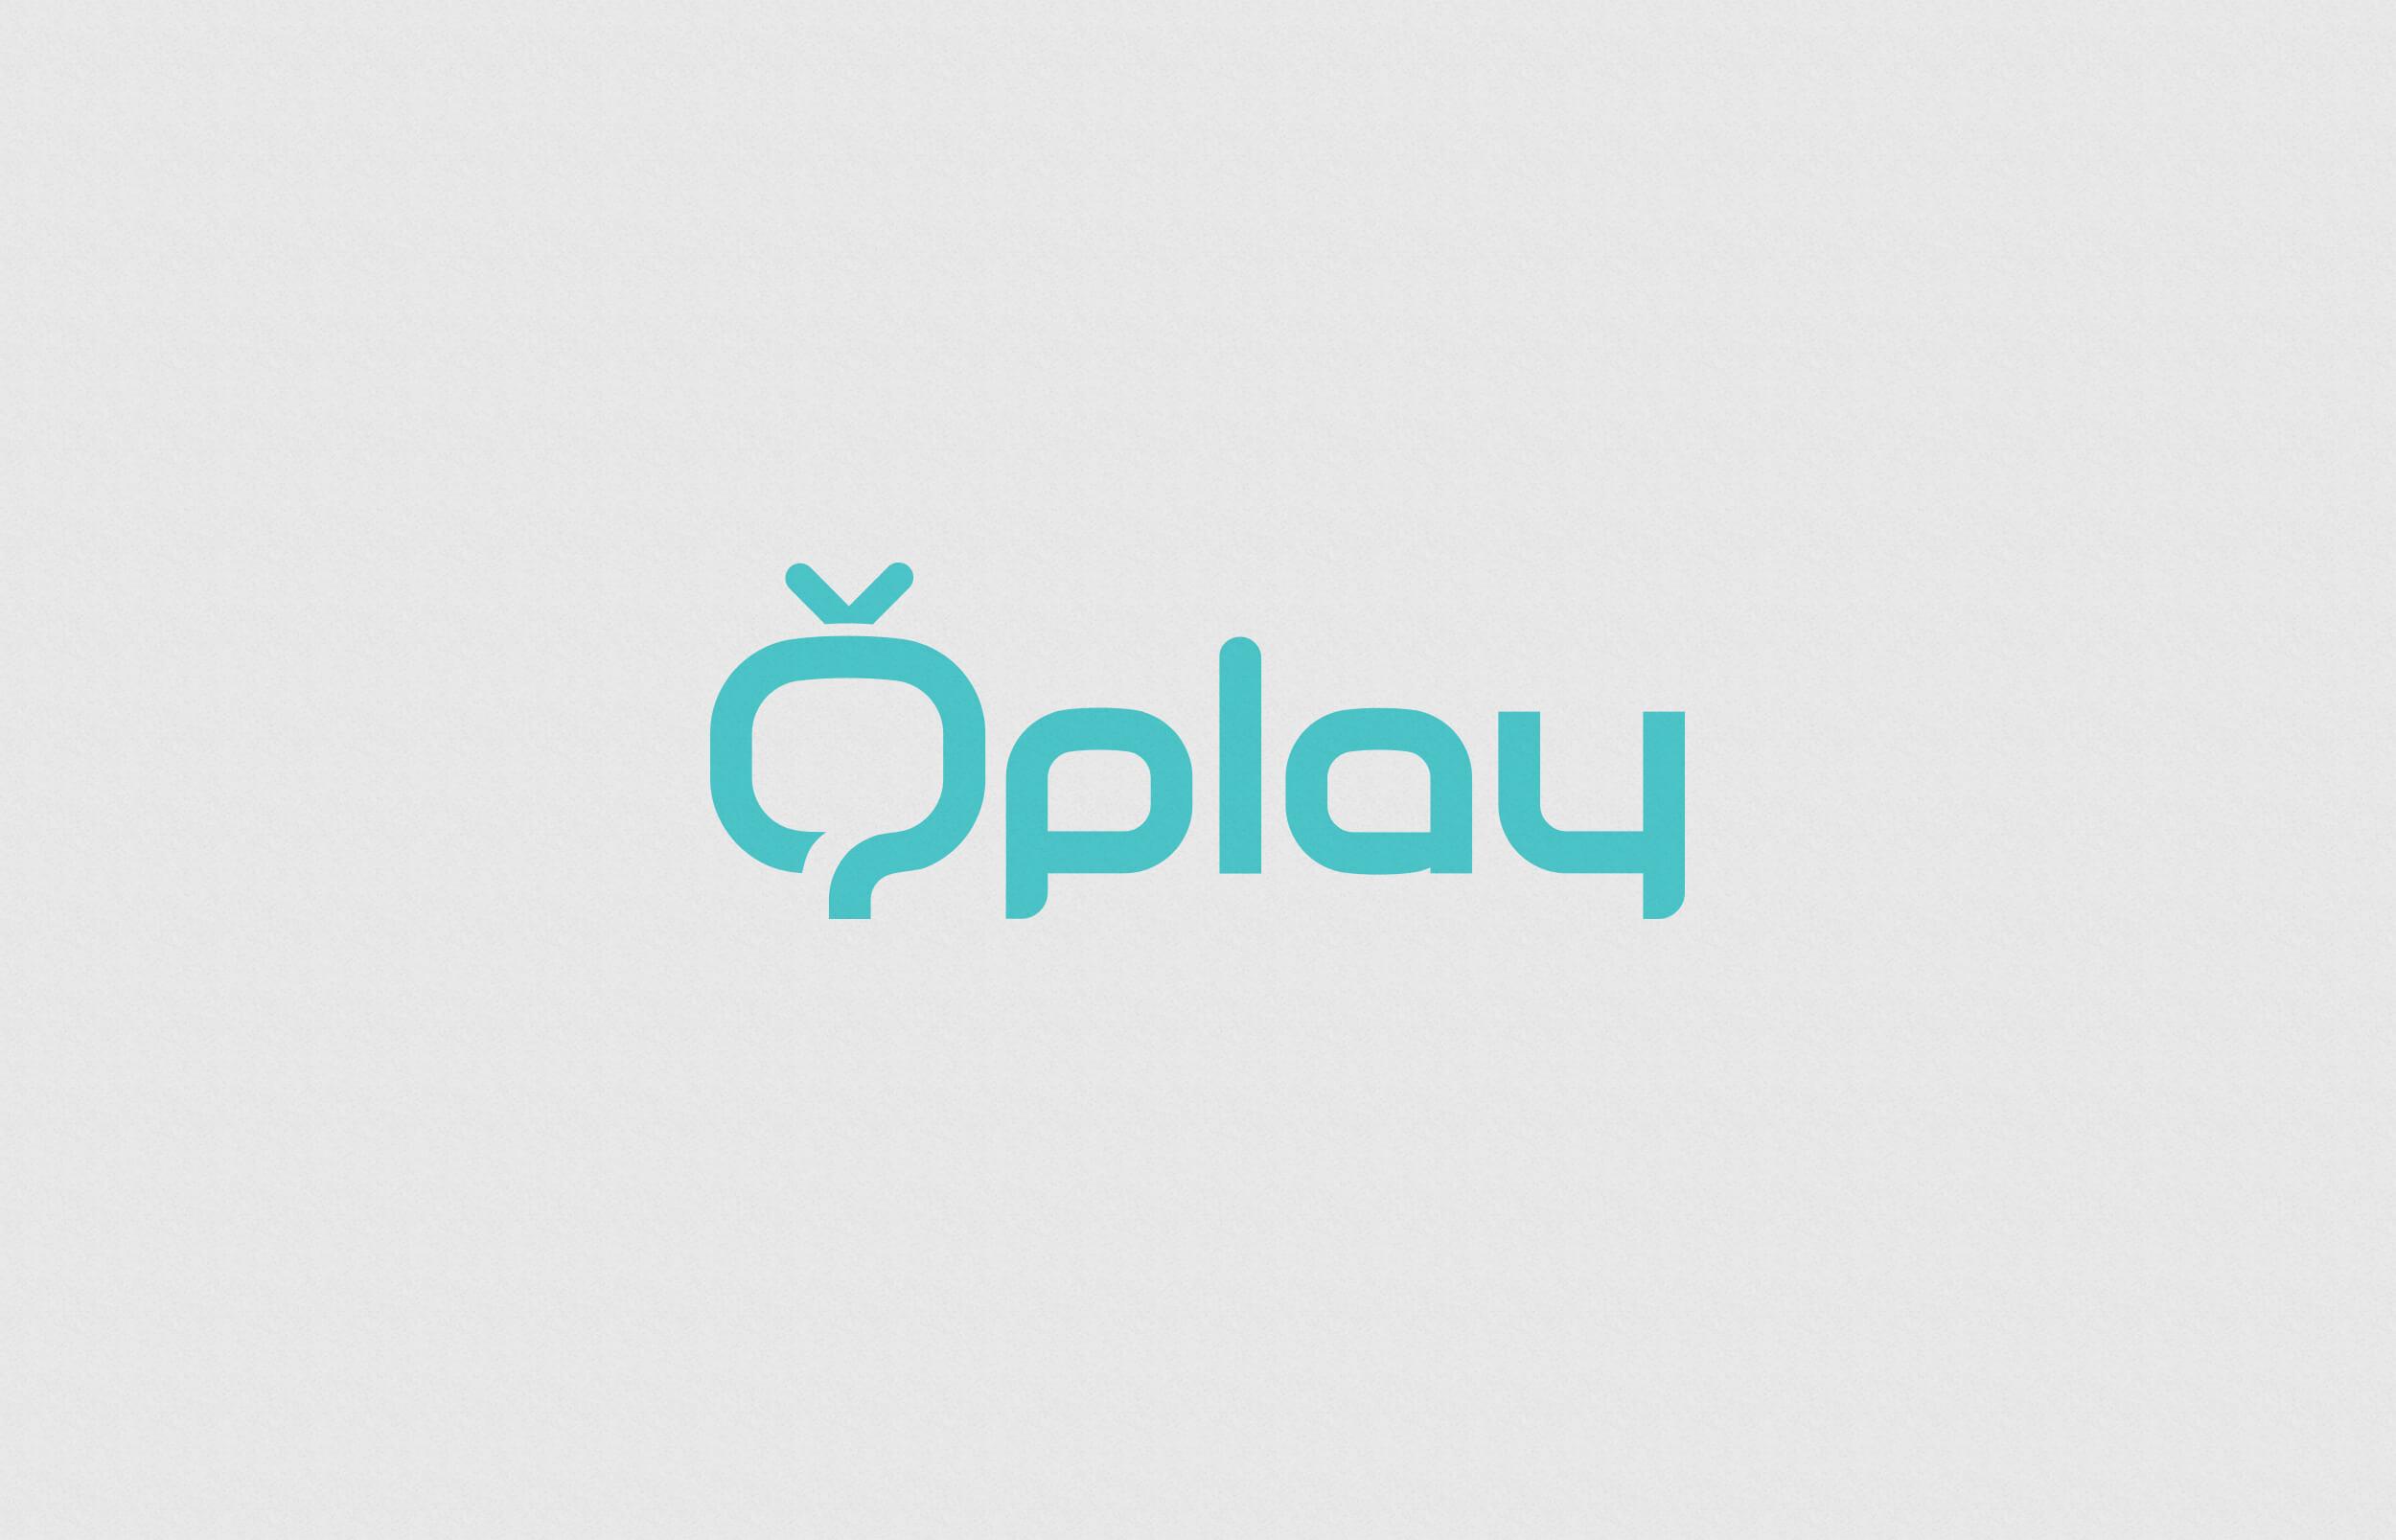 qplay-08.jpg